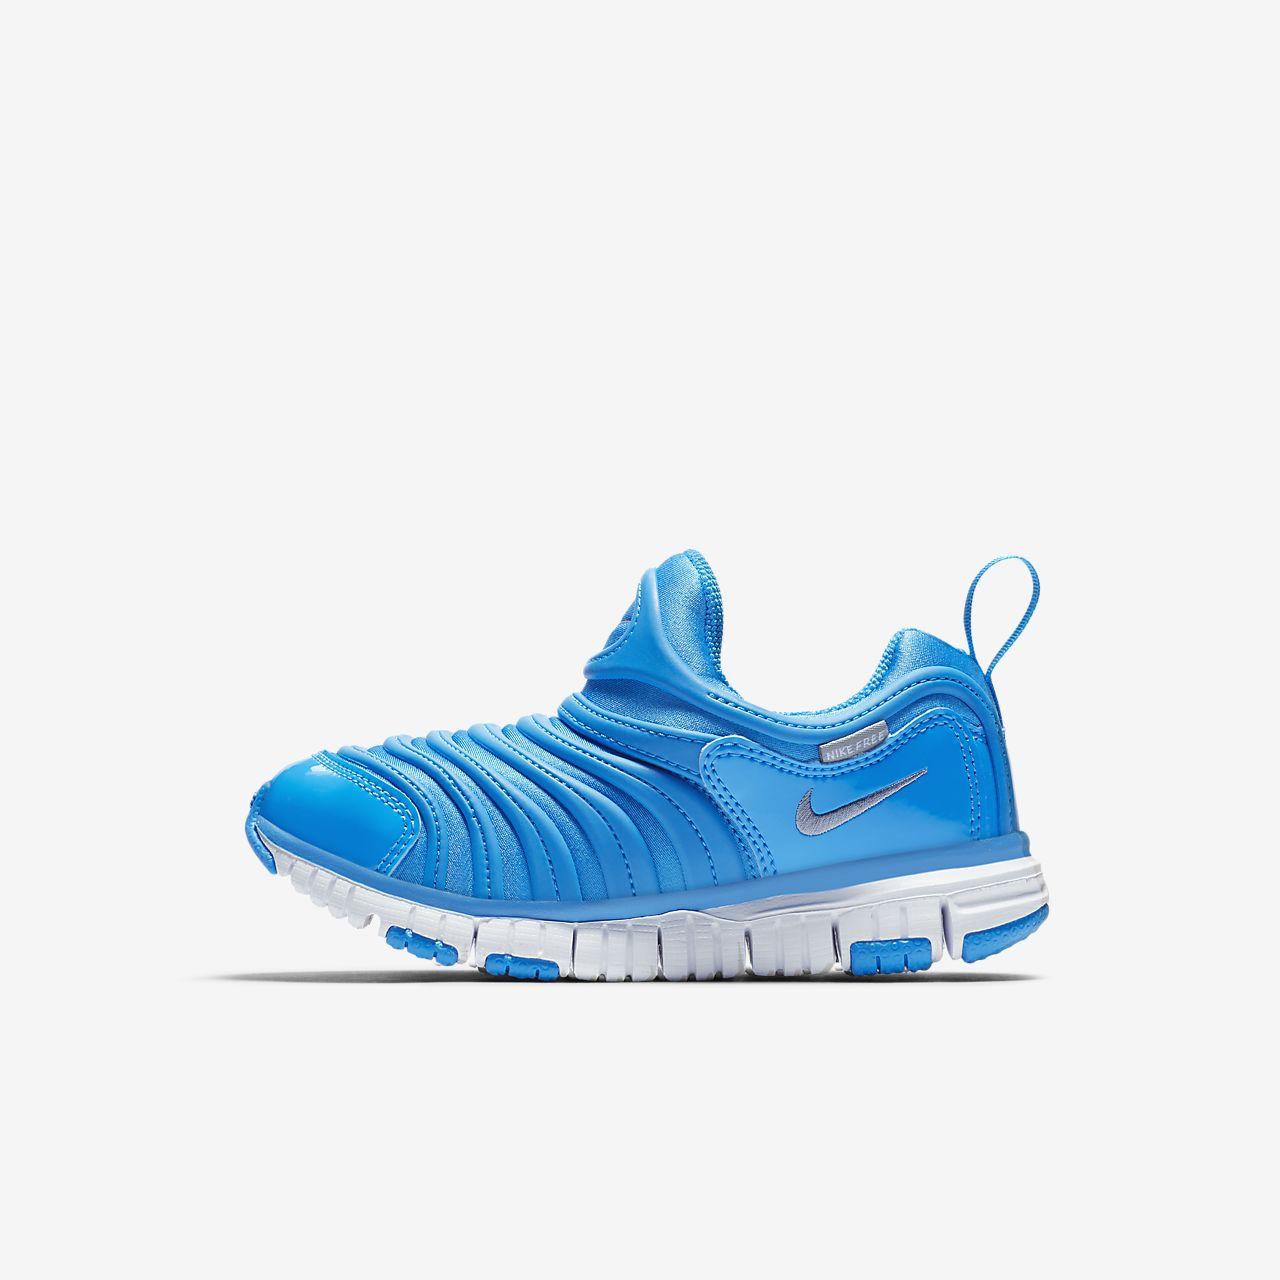 e585e9b5be8e Nike Dynamo Free Younger Kids  Shoe. Nike.com GB